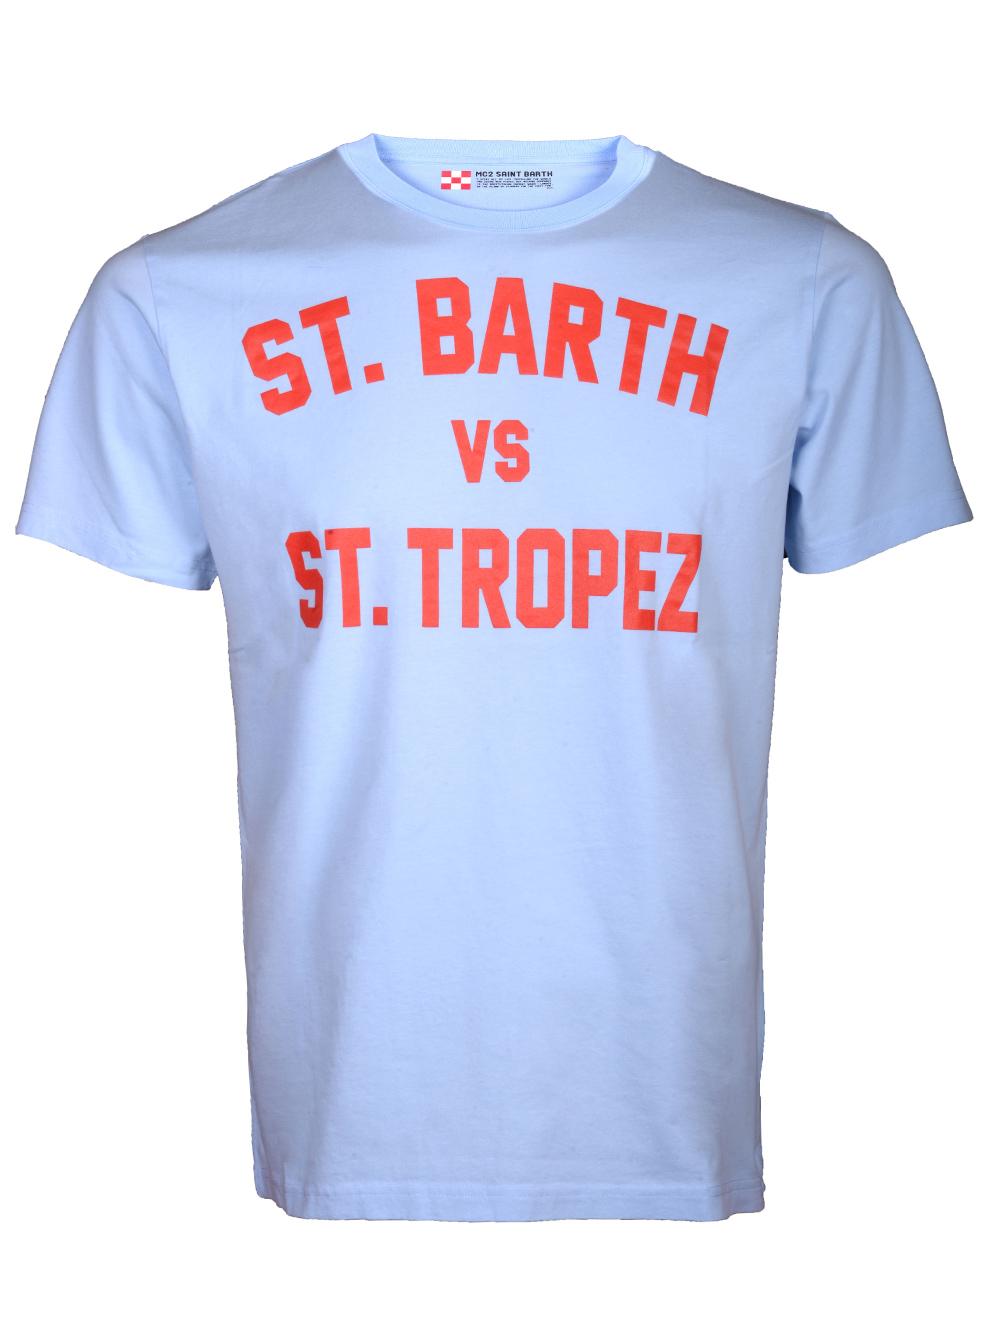 Mc2 St.BarthSALT WATER Μπλούζα t-shirt TSHIRT MAN ΛΕΥΚΟ